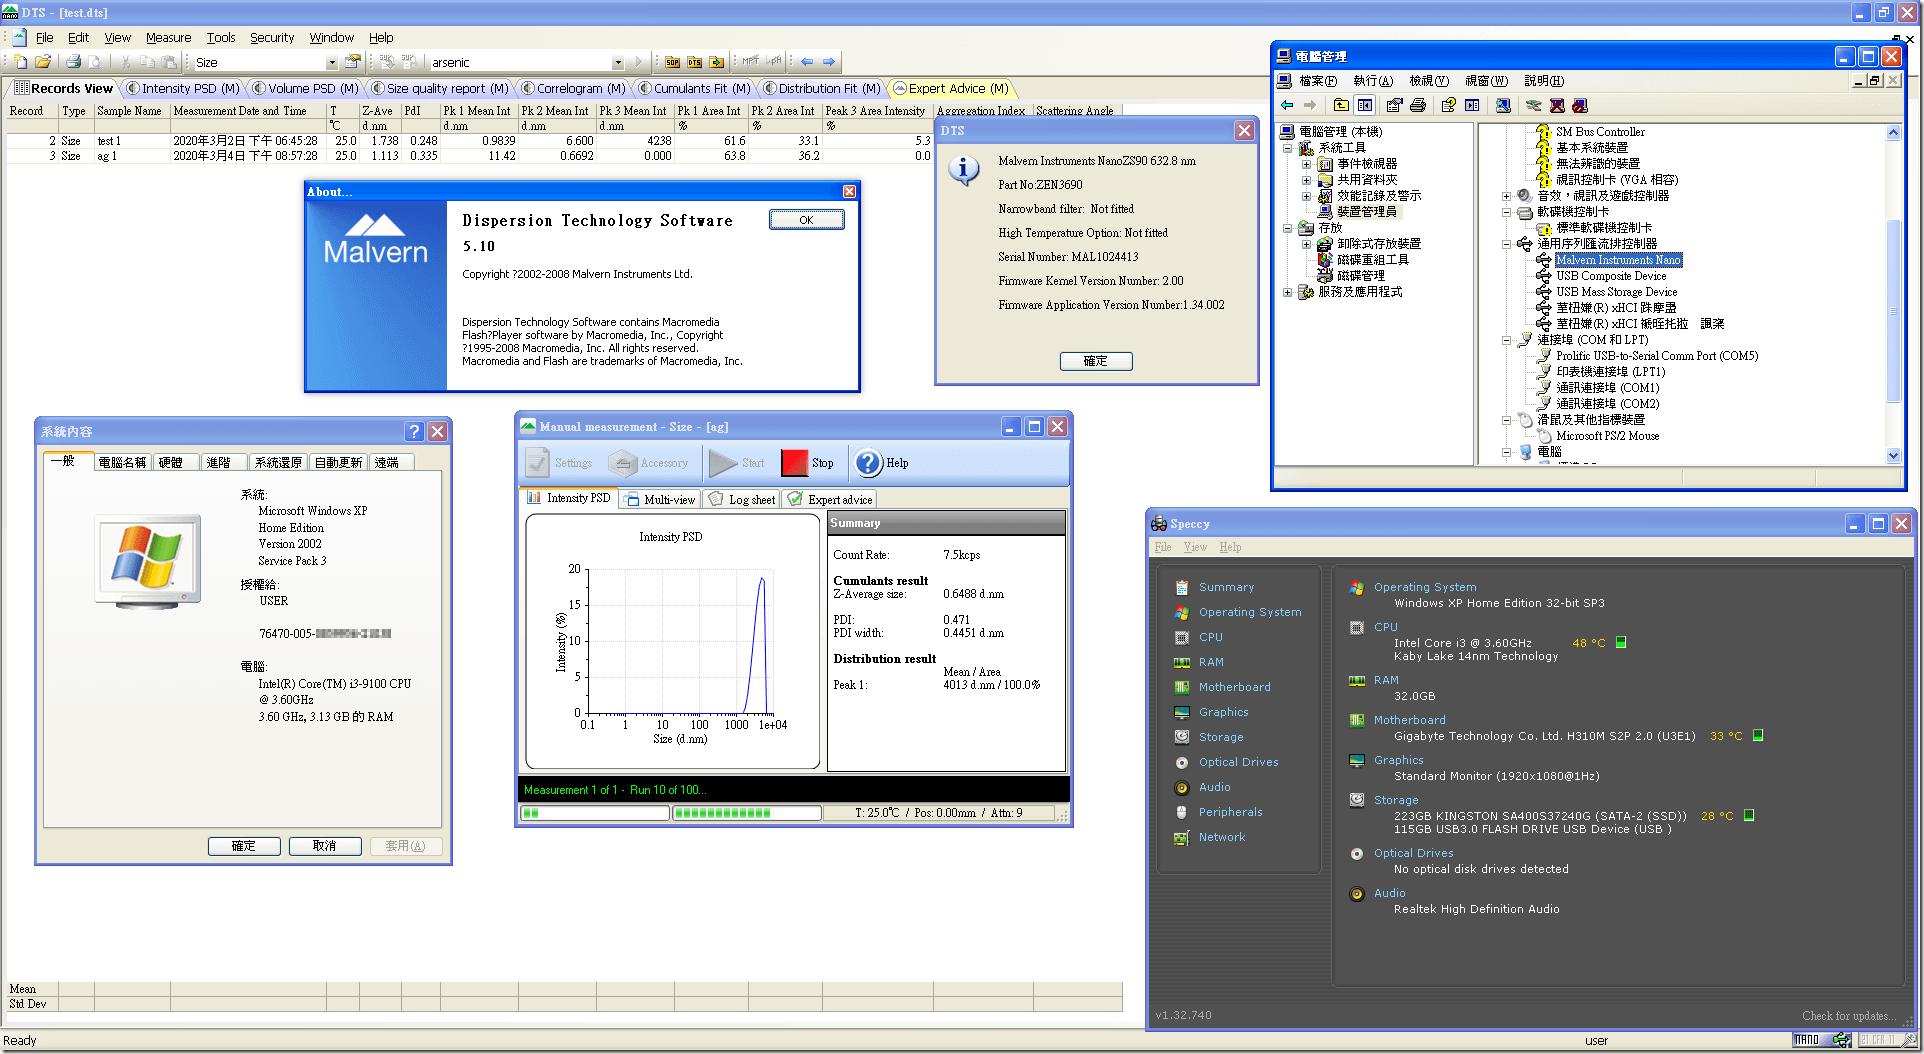 H310M_XP_DLS-USB-01